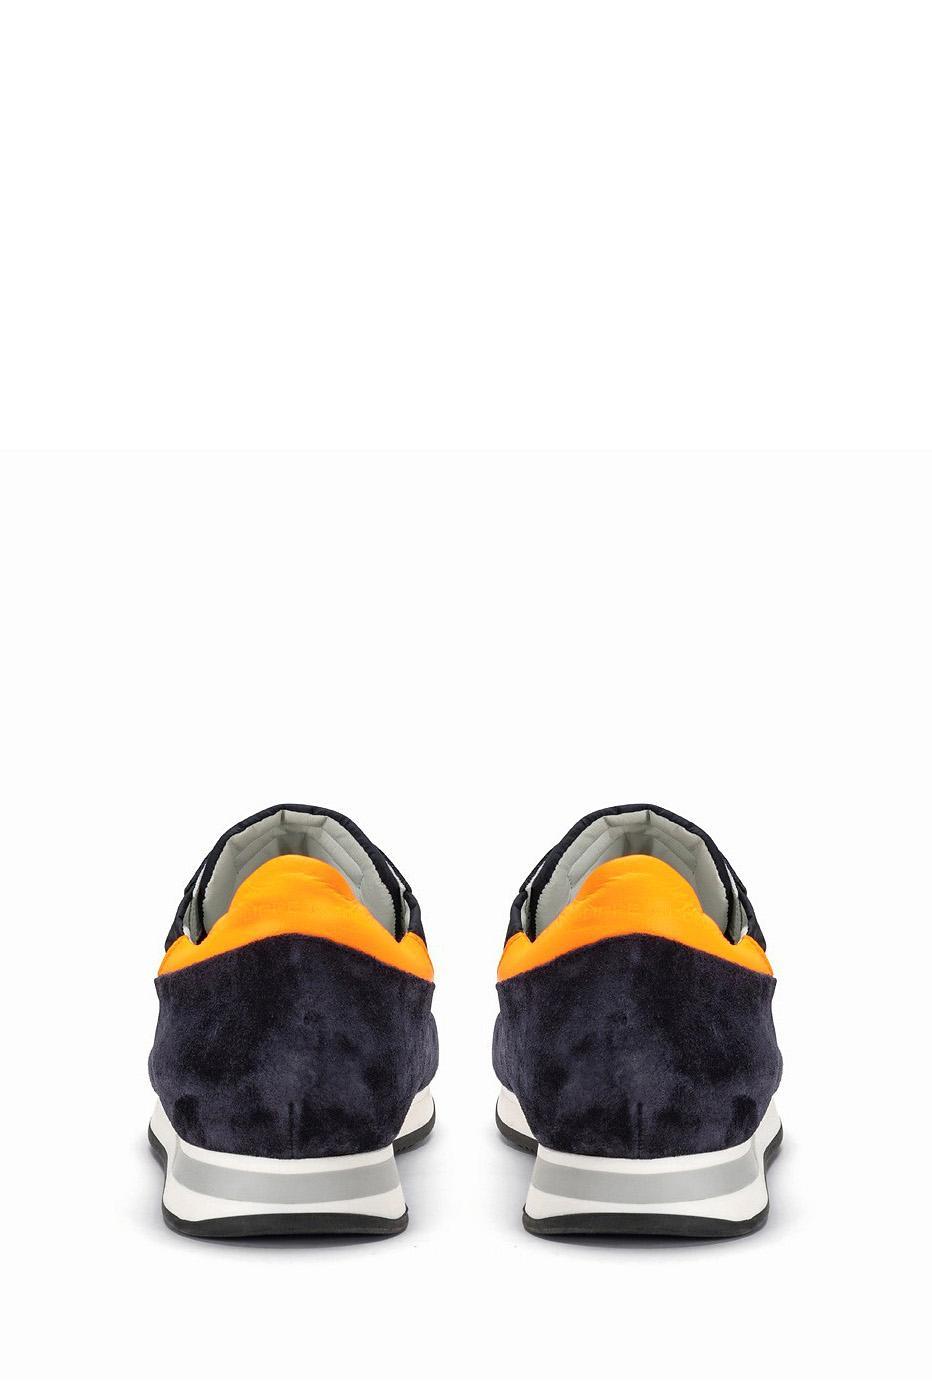 Philippe Model Herren Sneaker Tropez Mondial Olive Weiss